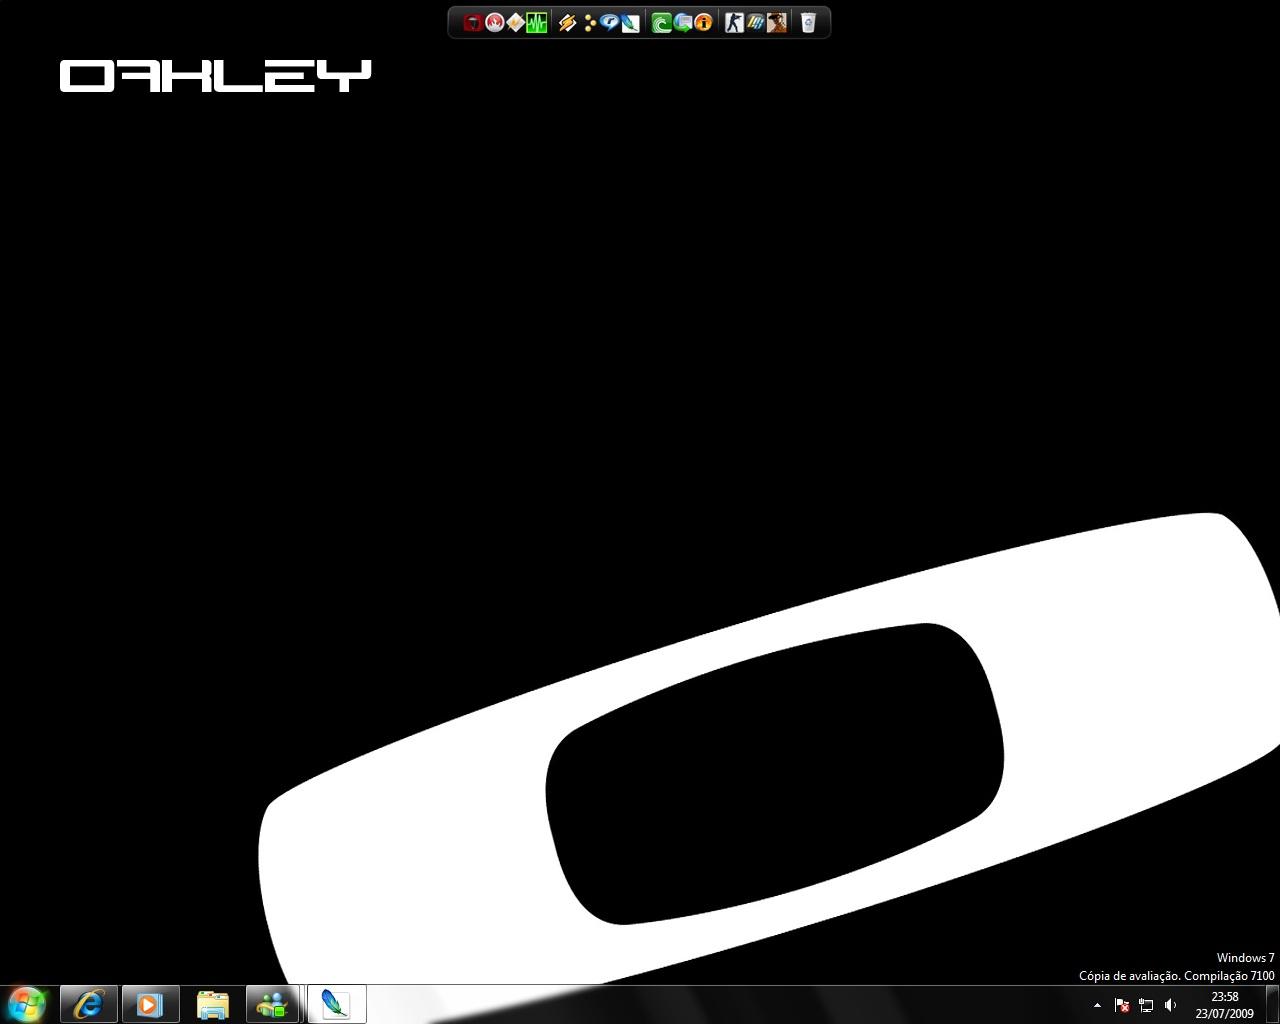 oakley sunglasses wallpaper  http://2.bp.blogspot/_lsy1t4urxl8/treh42oycmi/